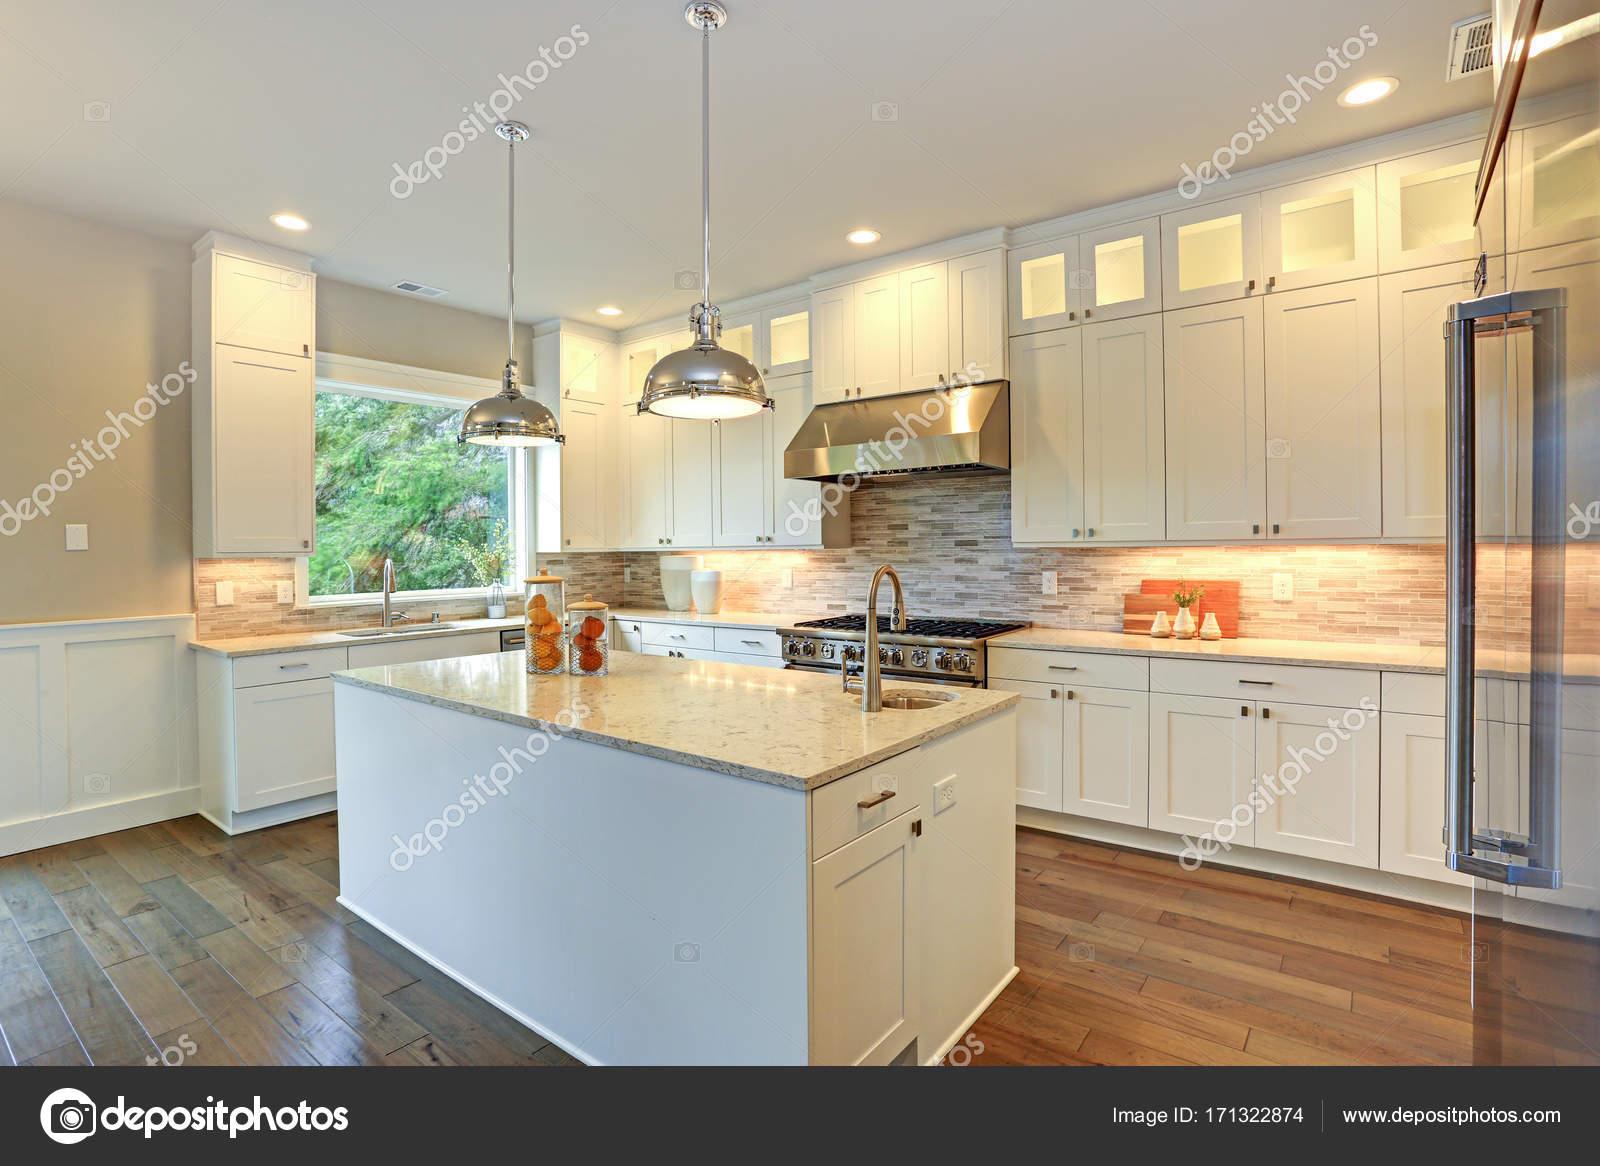 kitchen island counter glass cabinet knobs 奢华的白色厨房与大厨房岛 图库照片 c alabn 171322874